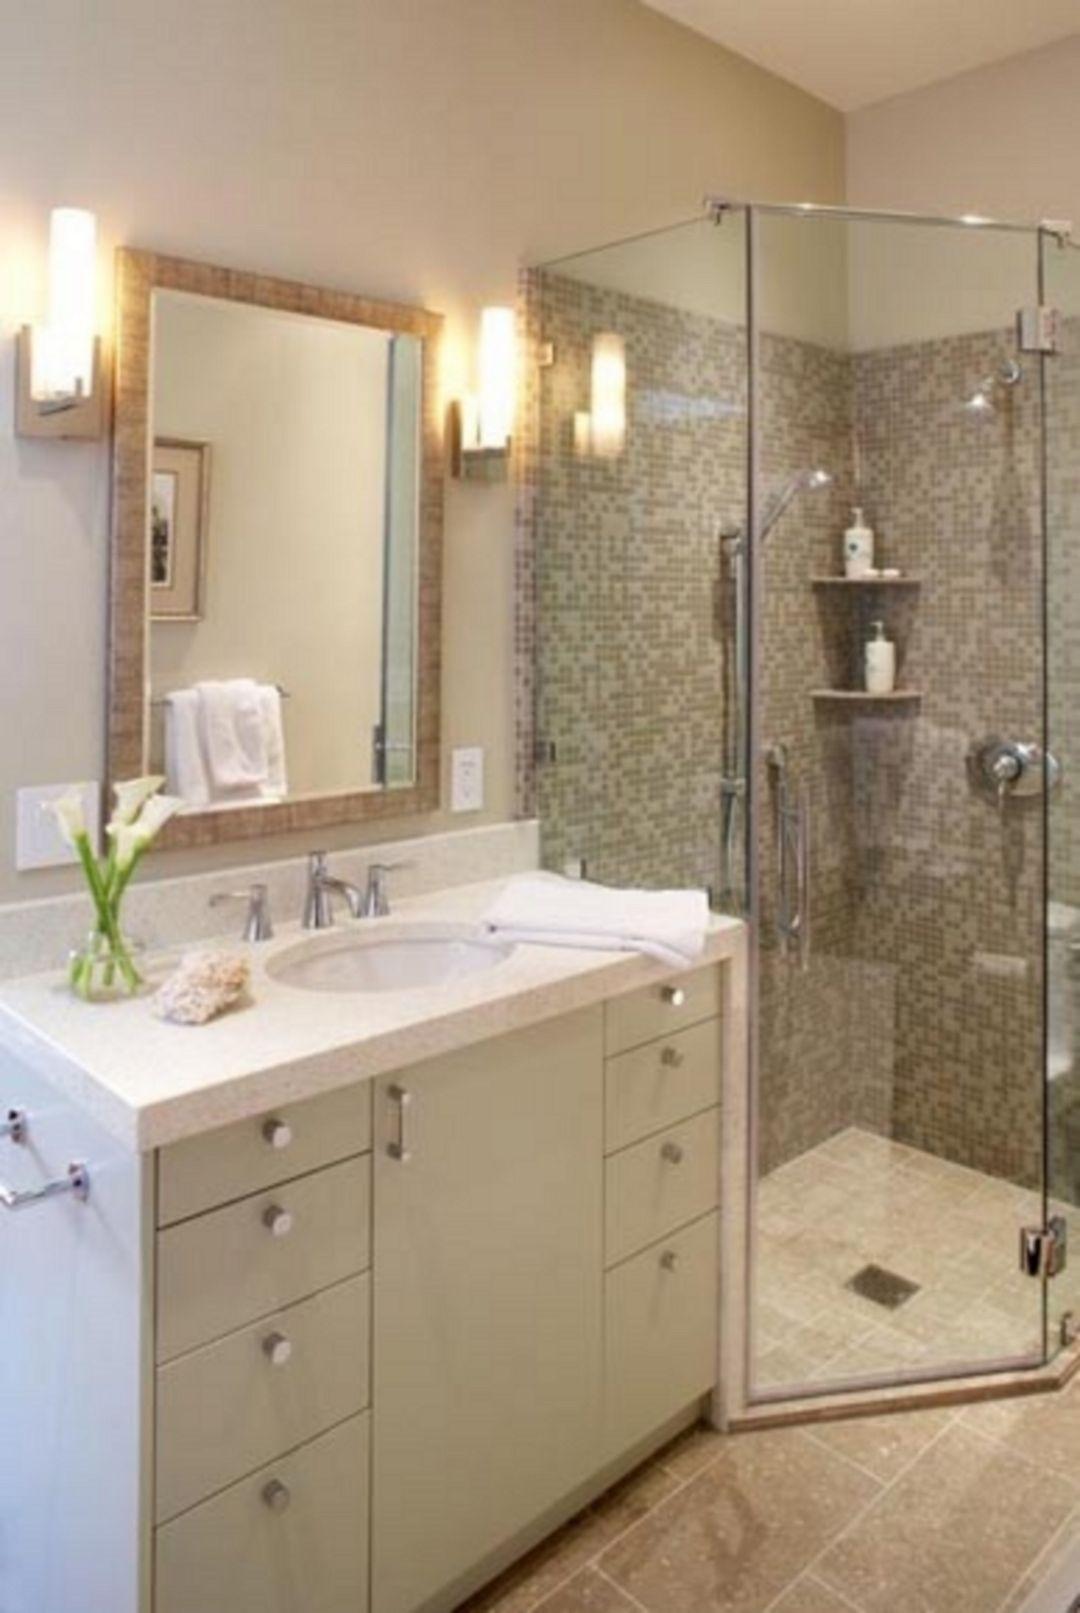 corner shower for small bathroom visual hunt rh visualhunt com bathroom design with corner shower bathroom design with corner shower